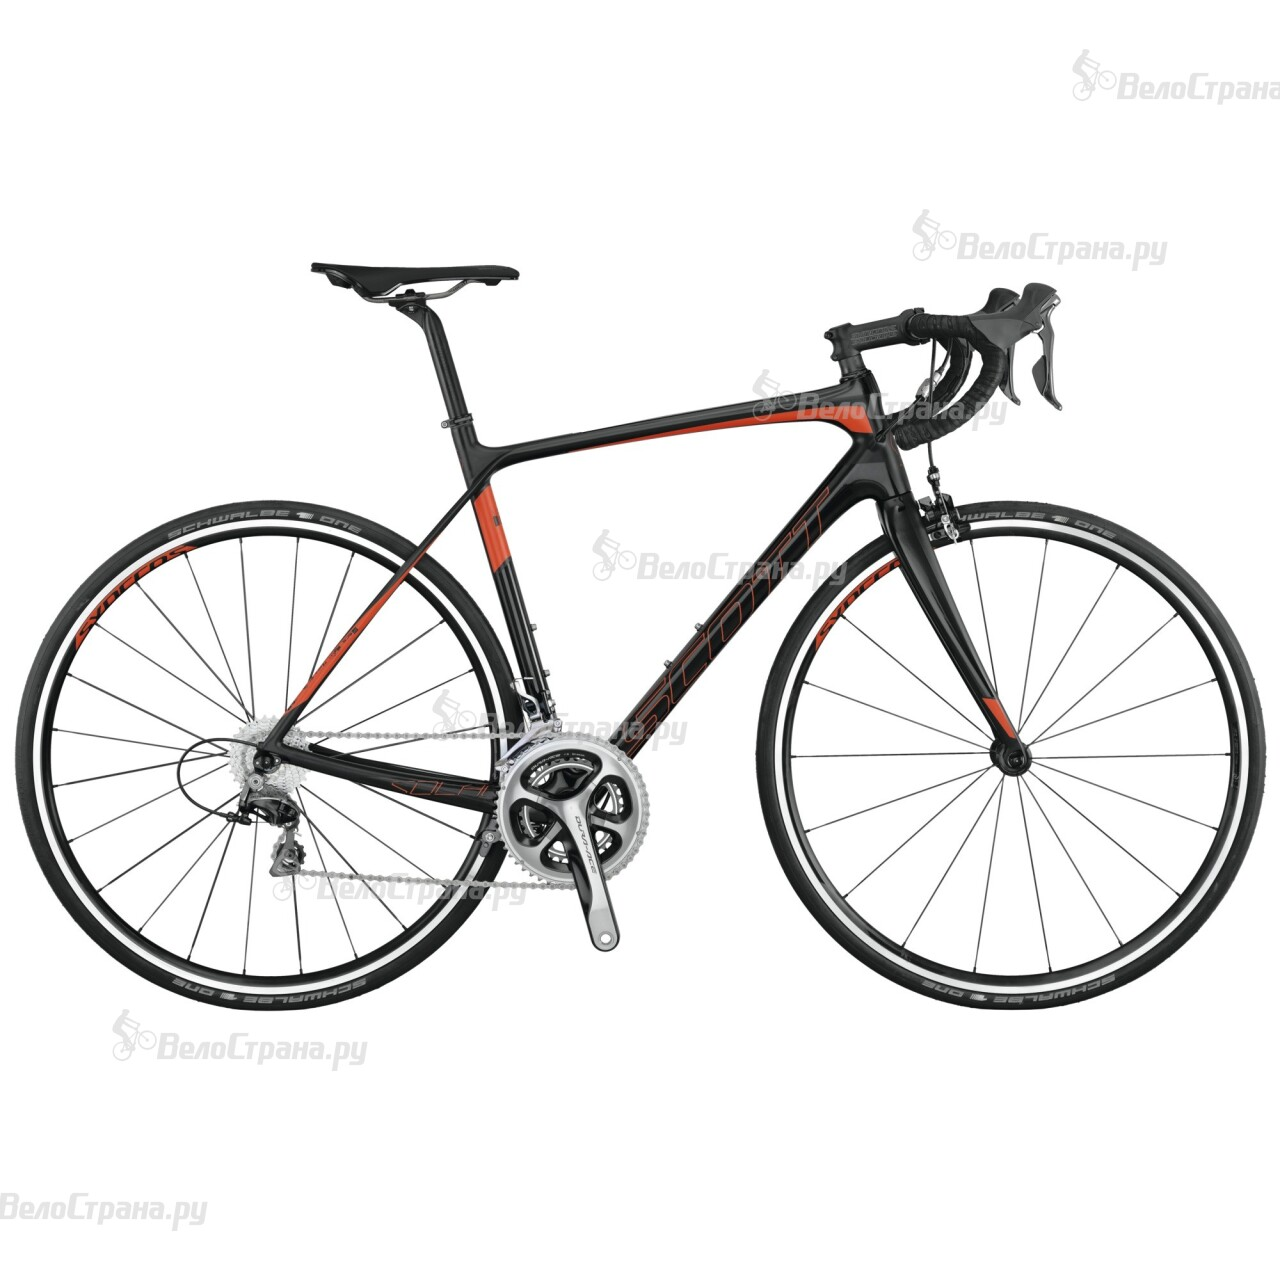 Велосипед Scott Solace 10 (2015) велосипед scott contessa solace 15 compact 2015